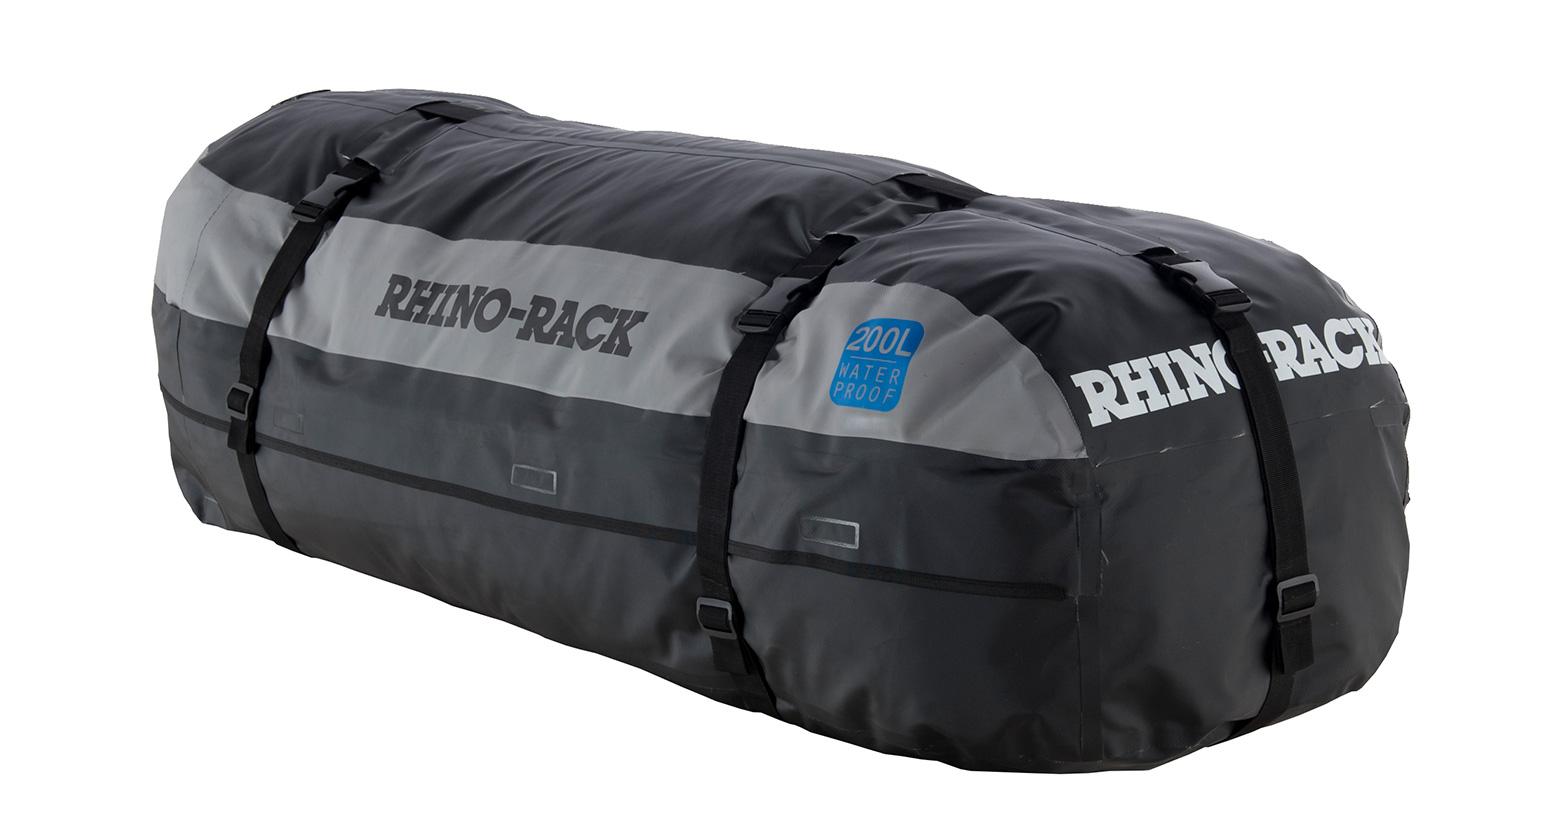 Lb200 Weatherproof Luggage Bag 200l Rhino Rack